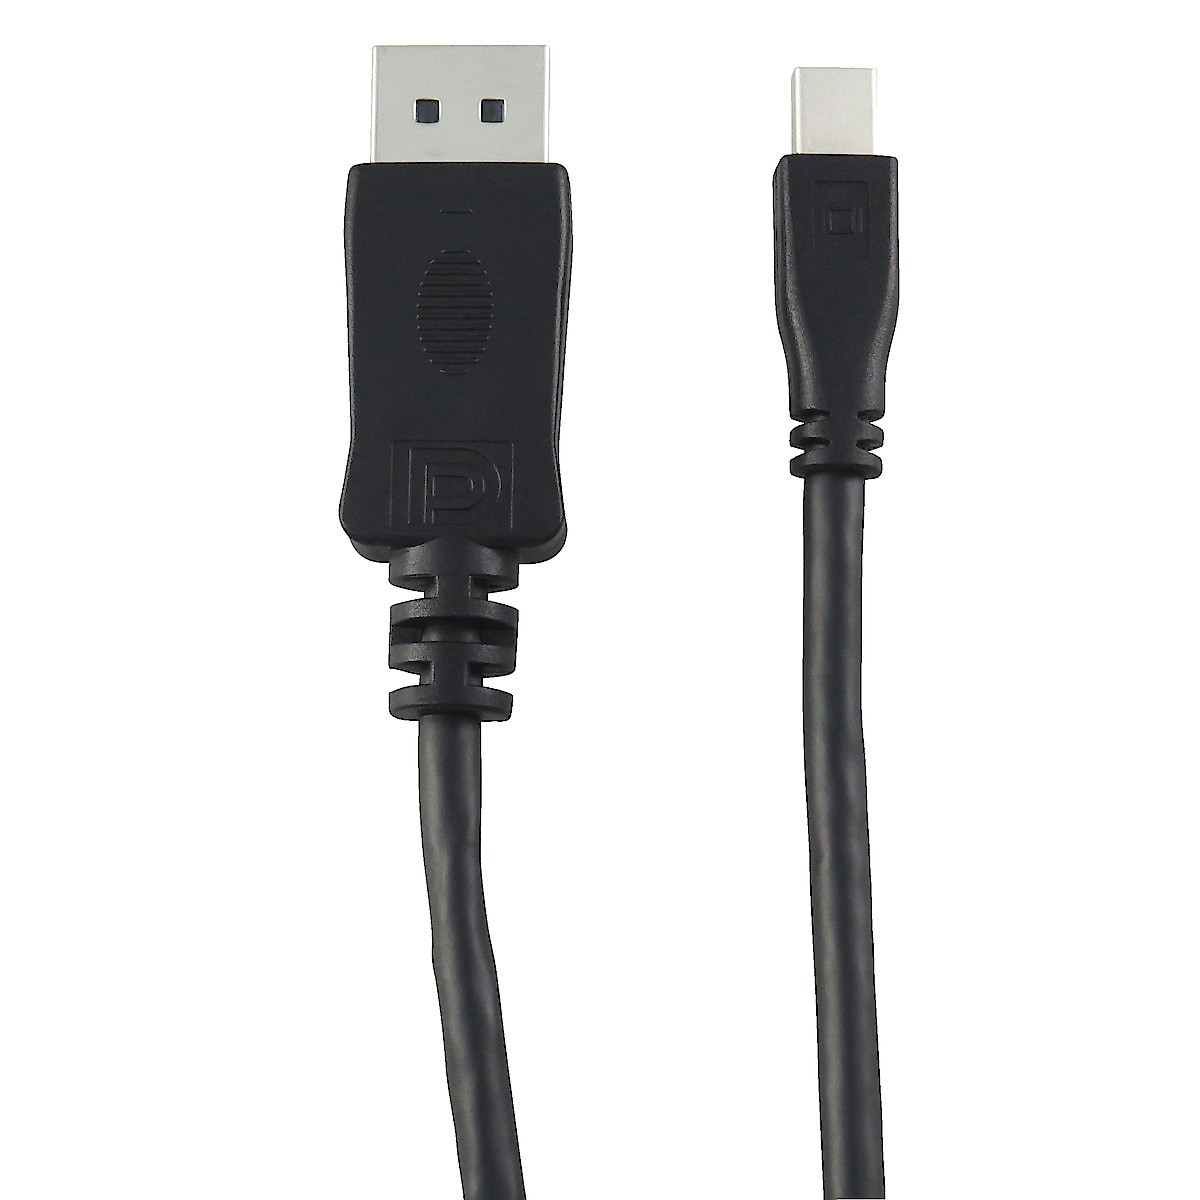 Adapterkabel Mini DisplayPort till DisplayPort